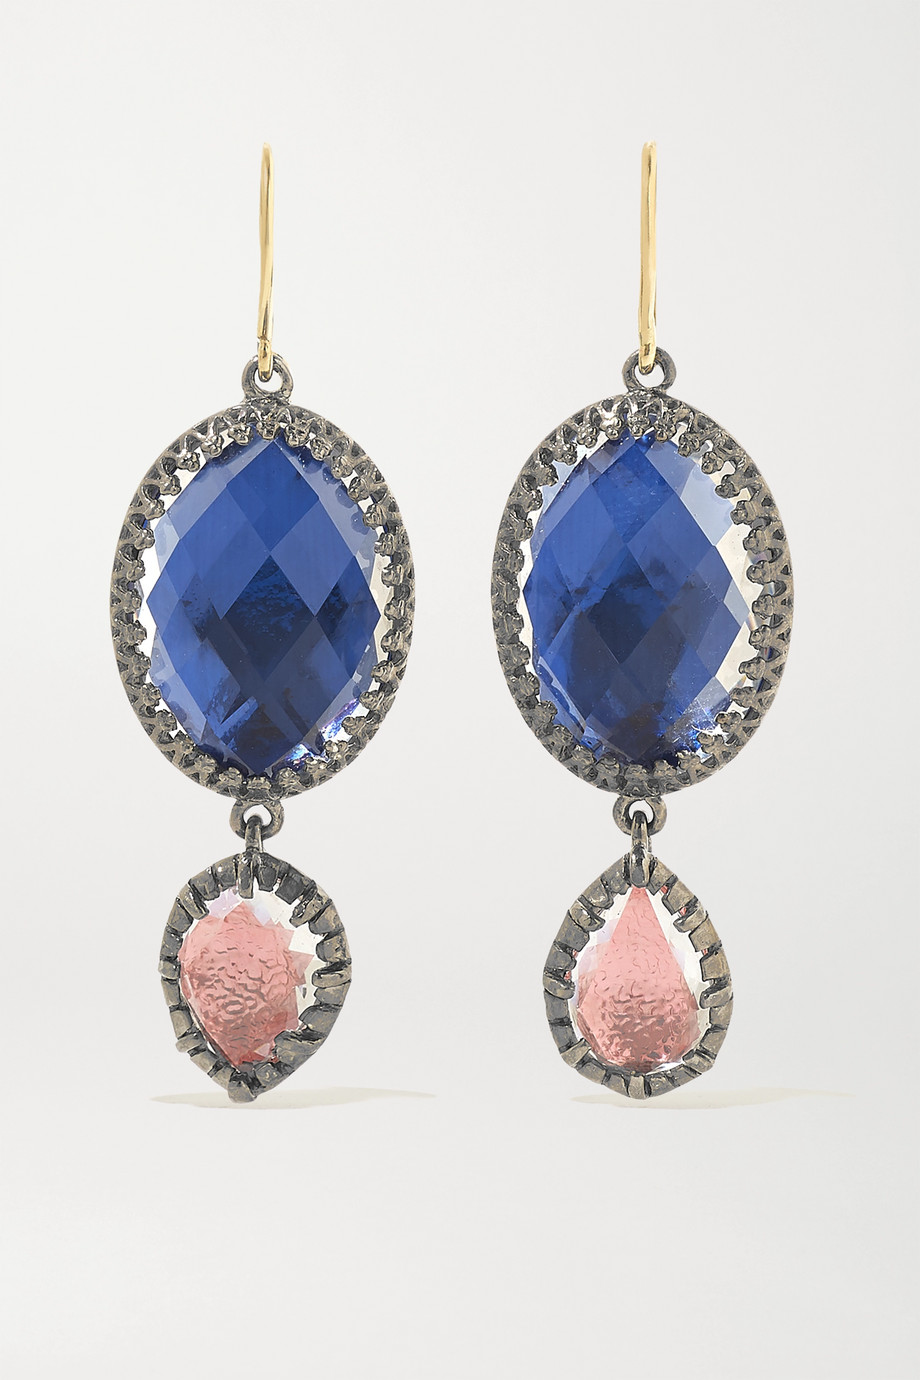 Larkspur & Hawk Sadie rhodium-dipped quartz earrings